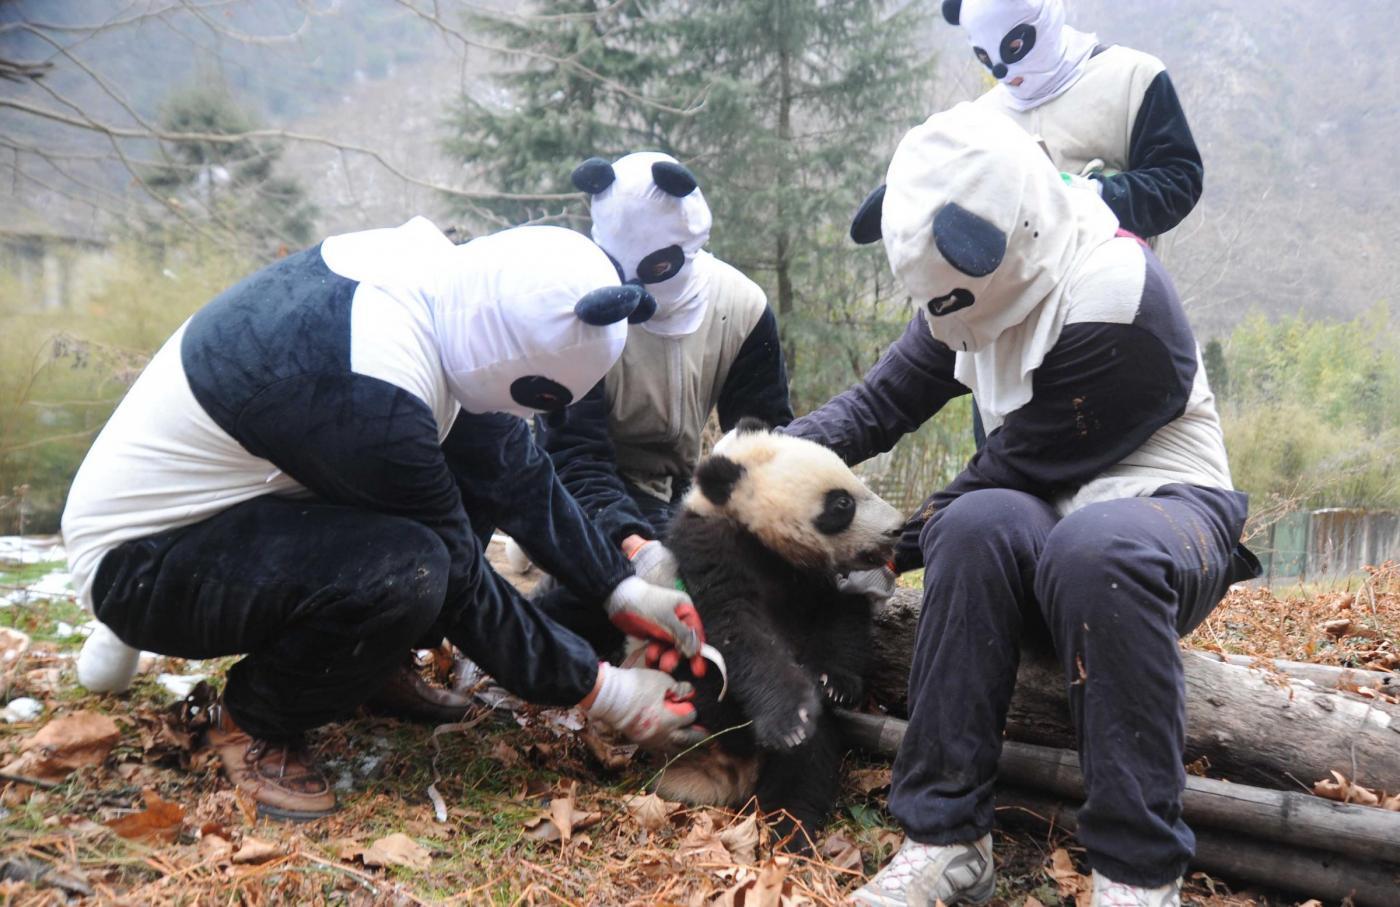 Cina: cuccioli di panda gigante nell'habitat del Sichuan ...